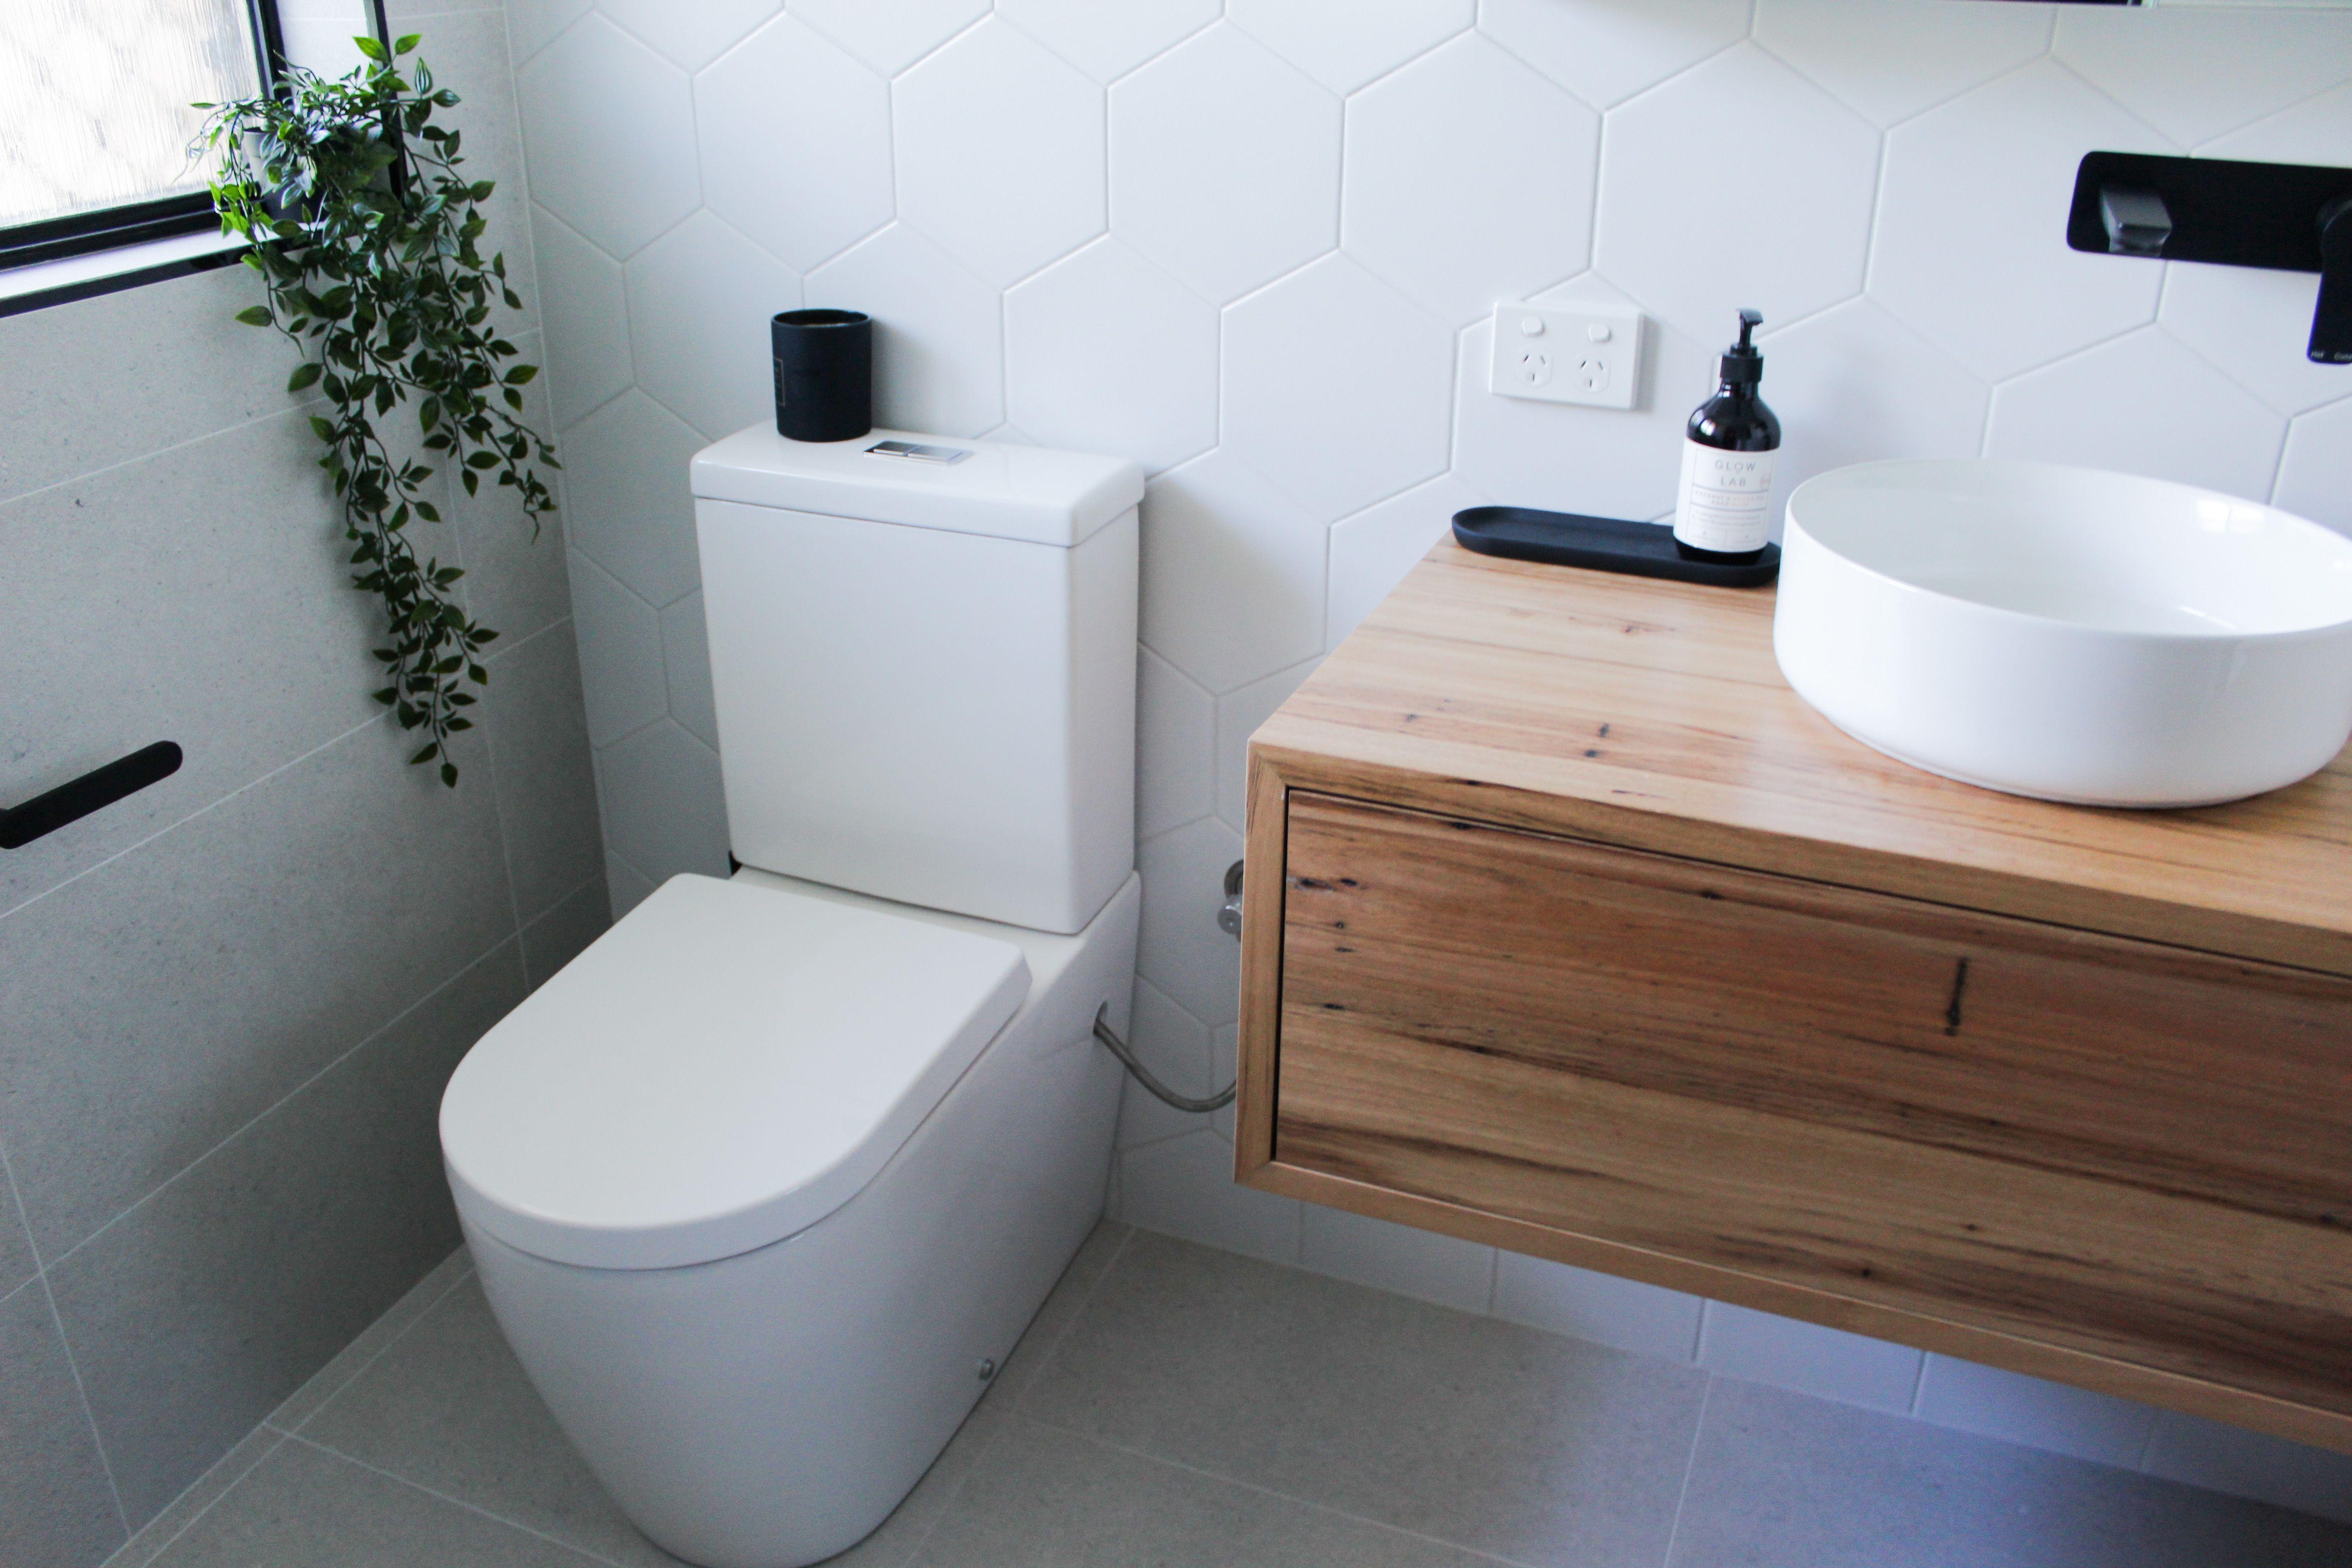 Small Ensuite Renovation Ideas Bathroom Renovation Trends Gray And White Bathroom Lavatory Design